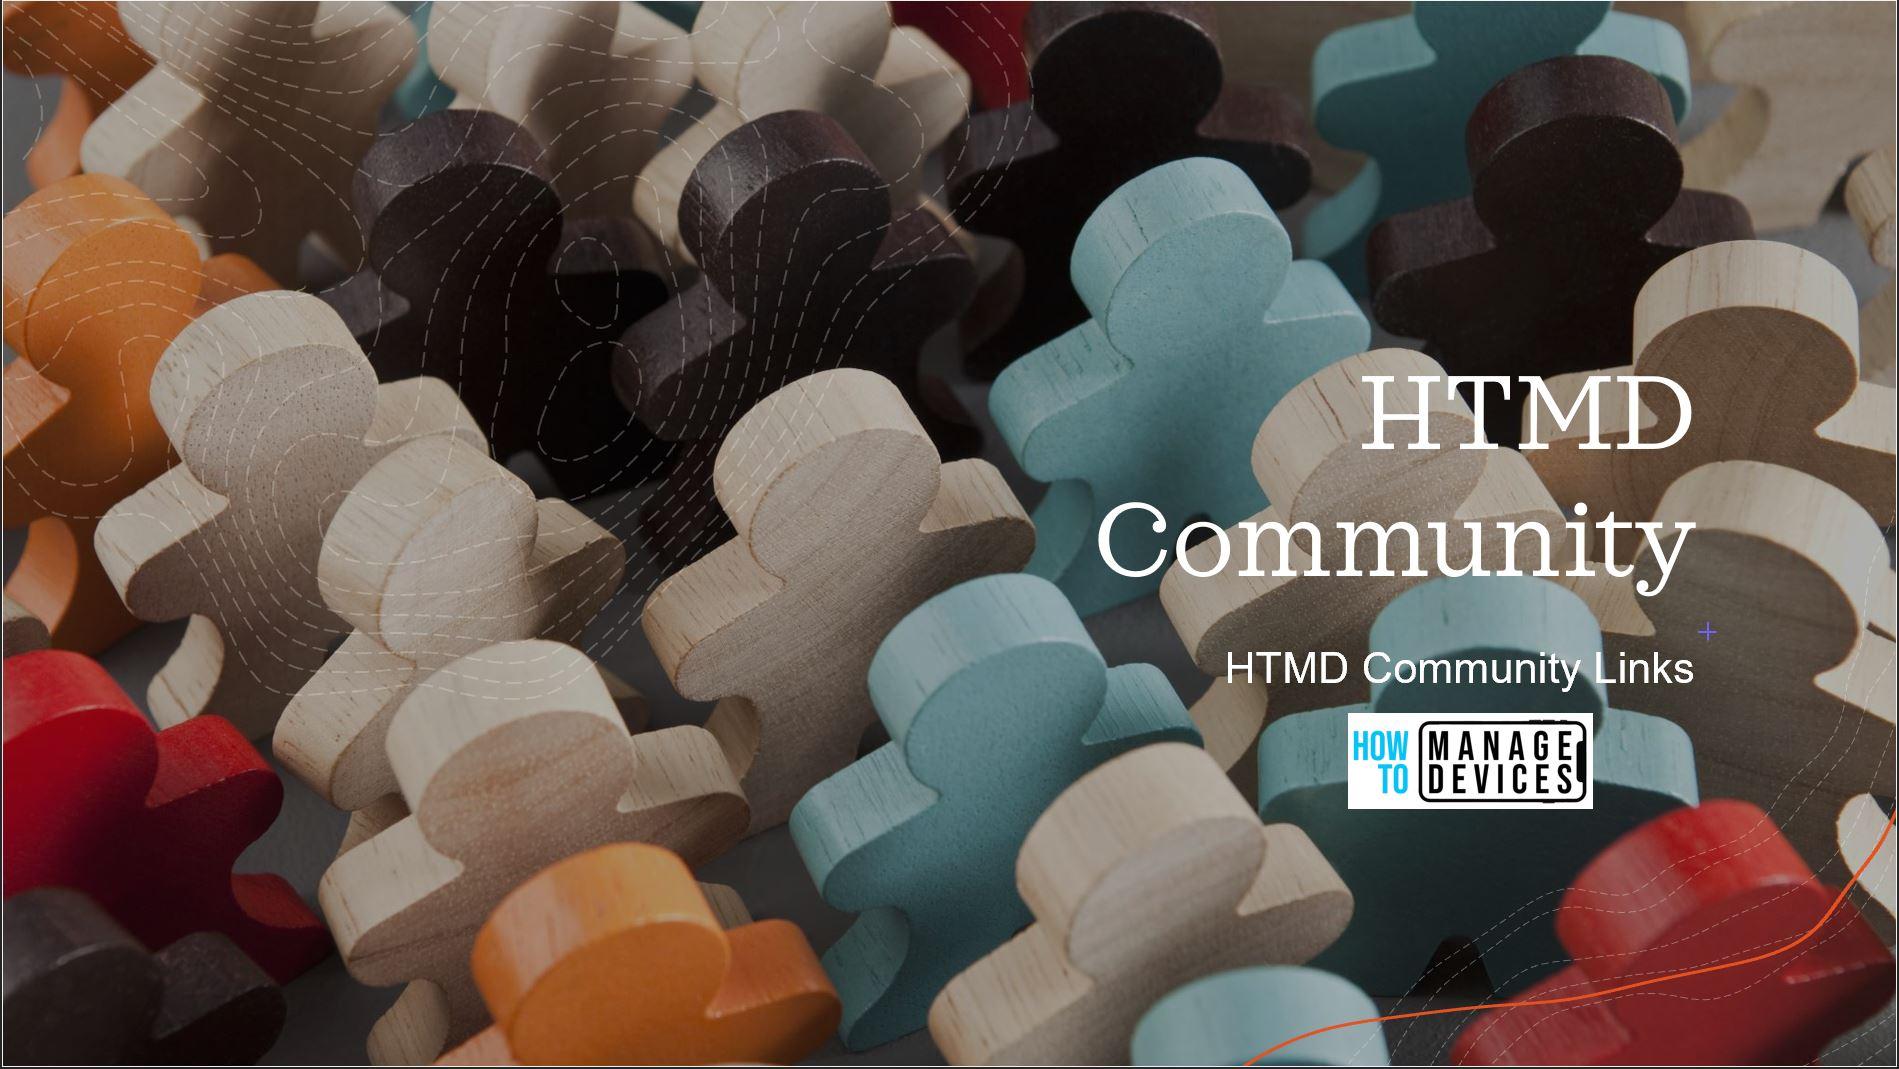 HTMD Community Links